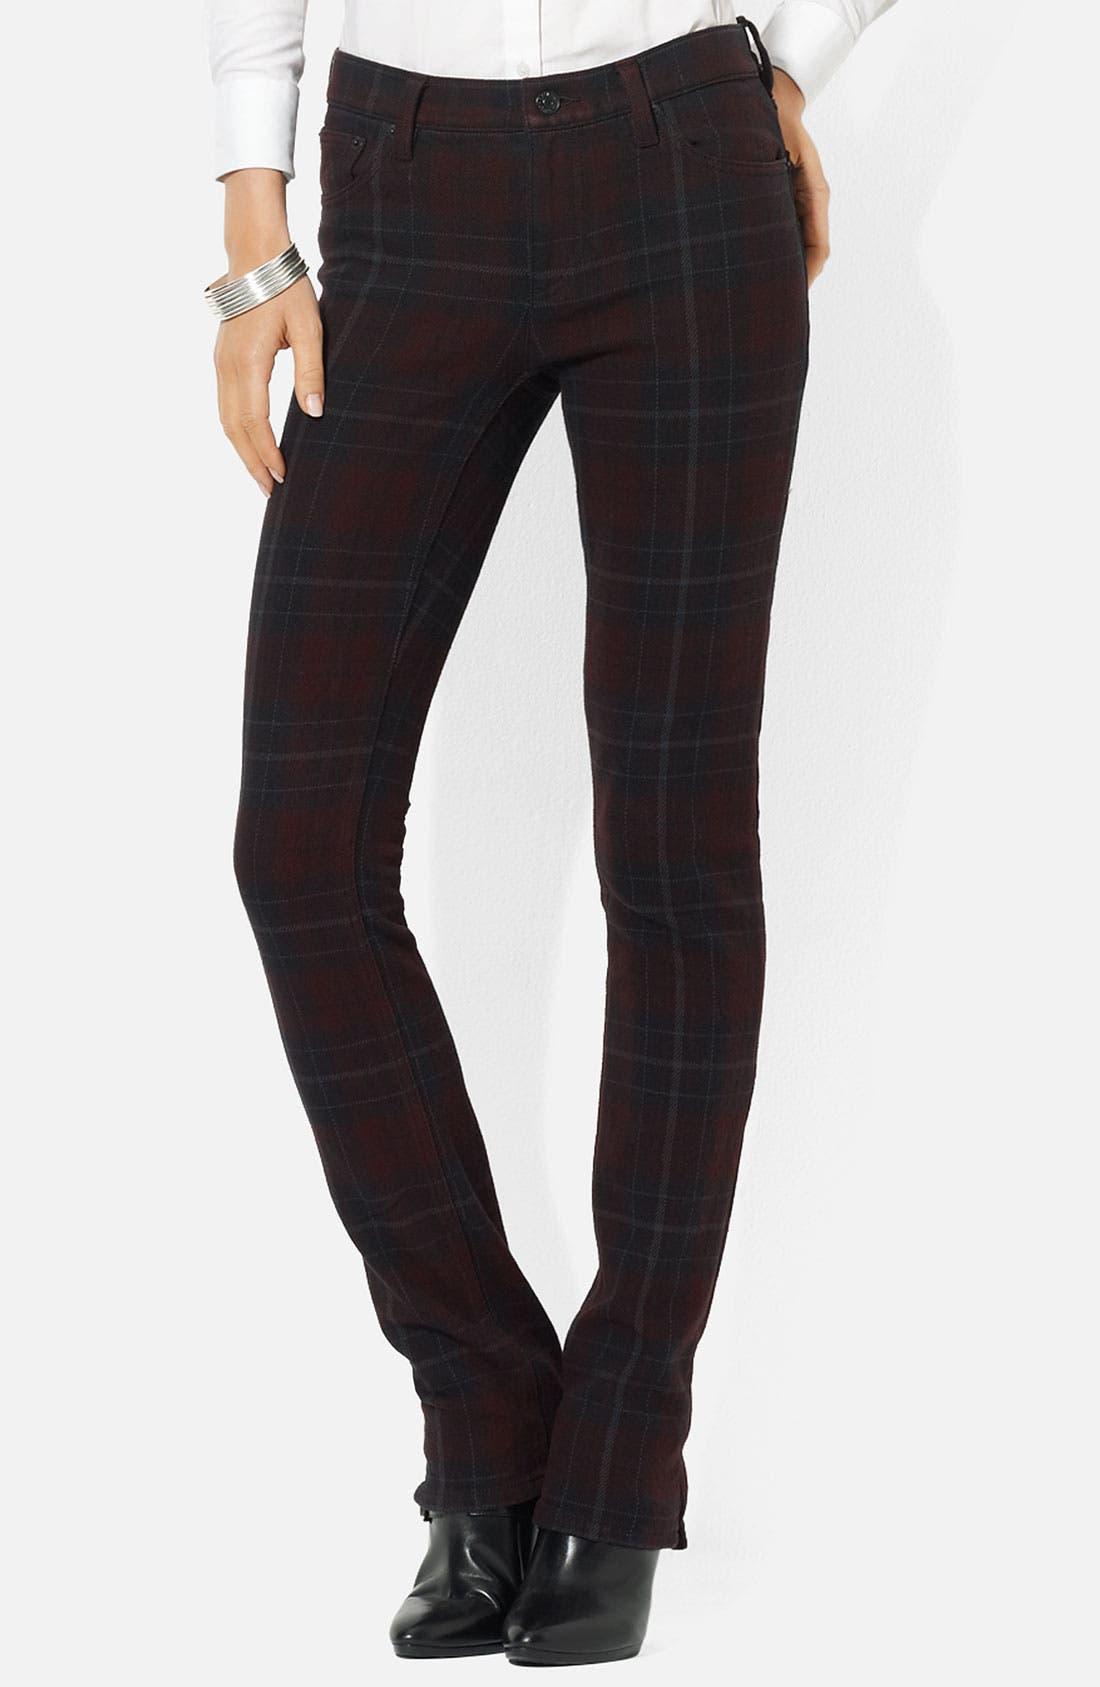 Alternate Image 1 Selected - Lauren Ralph Lauren Straight Leg Plaid Pants (Petite)